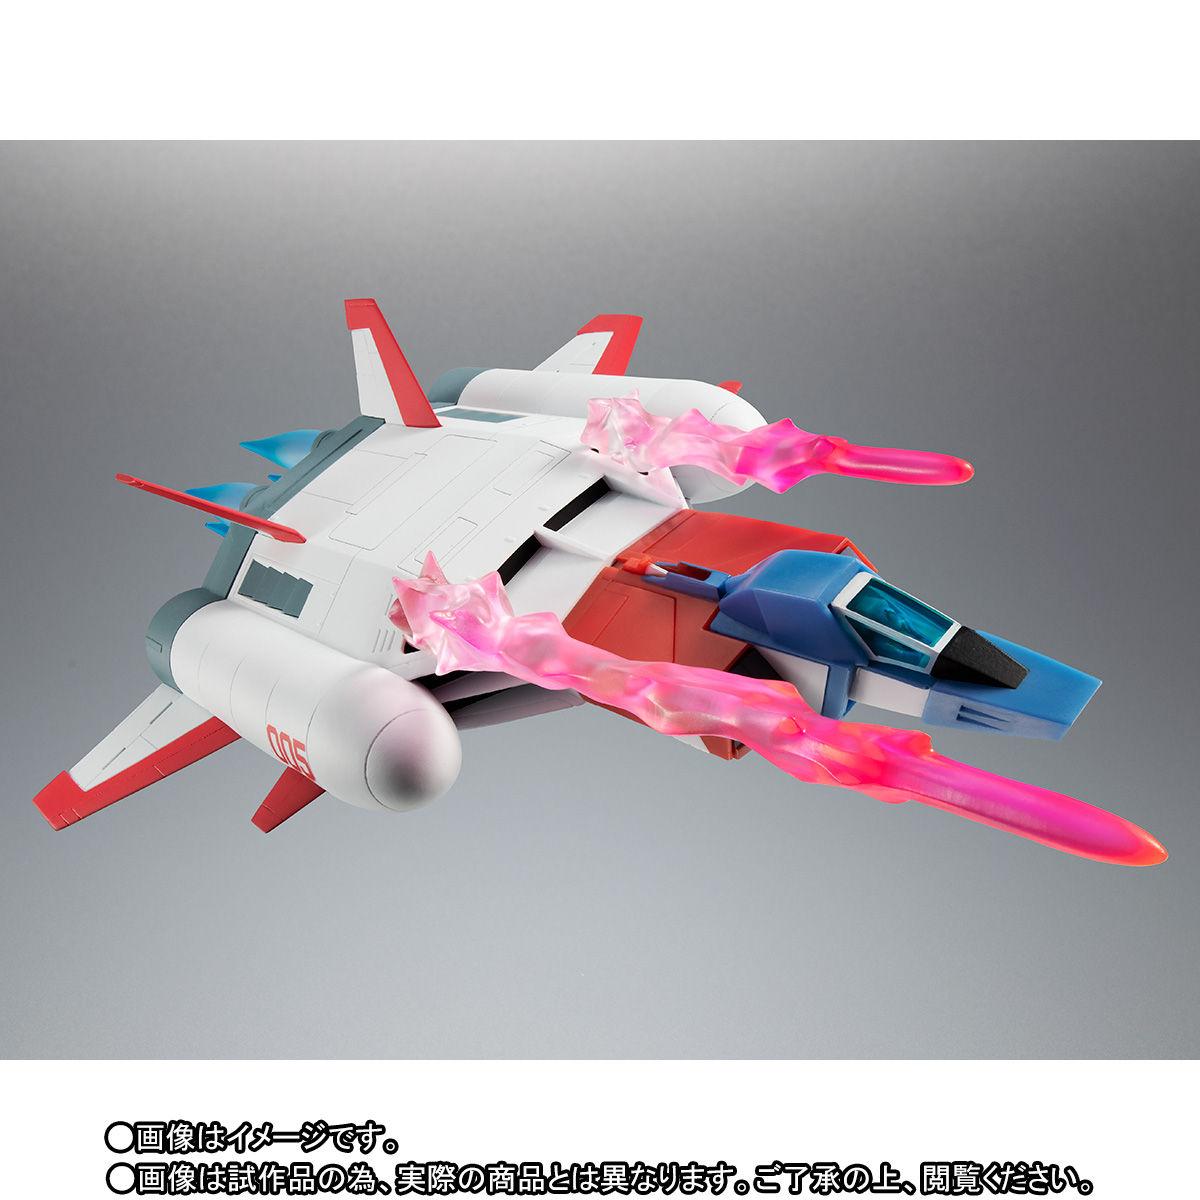 ROBOT魂〈SIDE MS〉『FF-X7-Bst コア・ブースター 2機セット ver. A.N.I.M.E. ~スレッガー005 & セイラ006~』機動戦士ガンダム 可動フィギュア-004